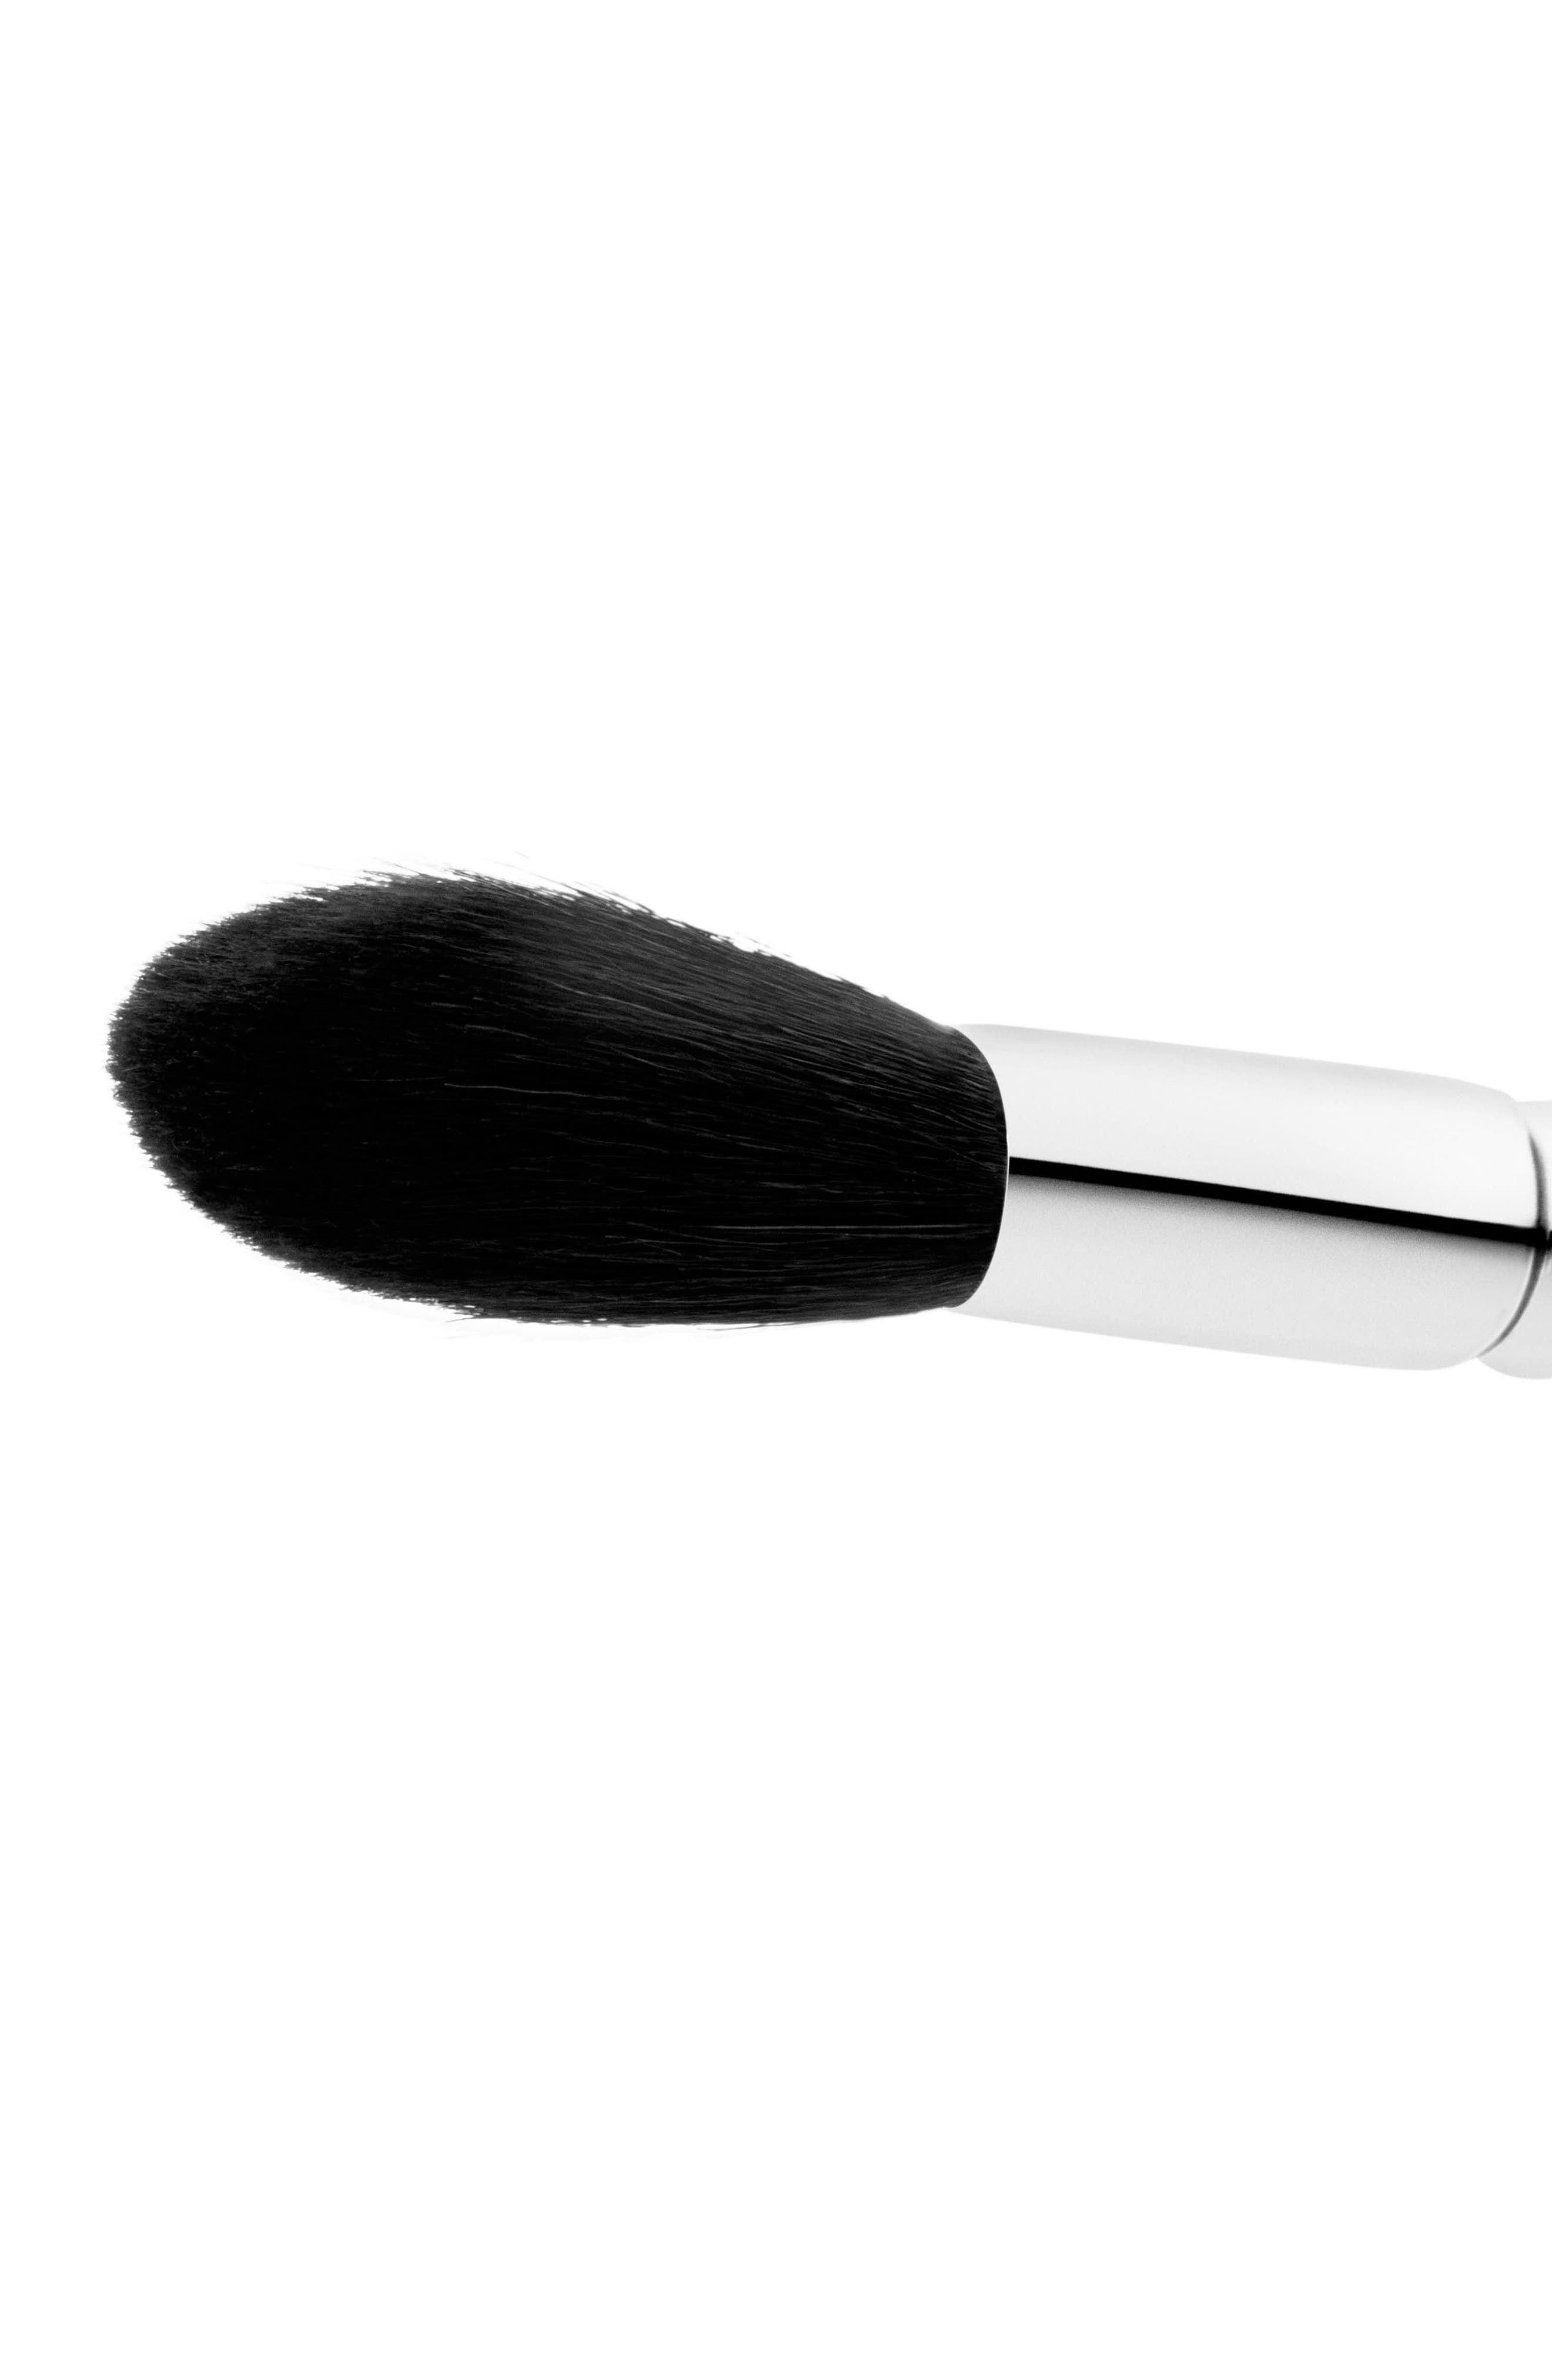 MAC 129SHS Synthetic Powder/Blush Brush,                             Alternate thumbnail 2, color,                             No Color